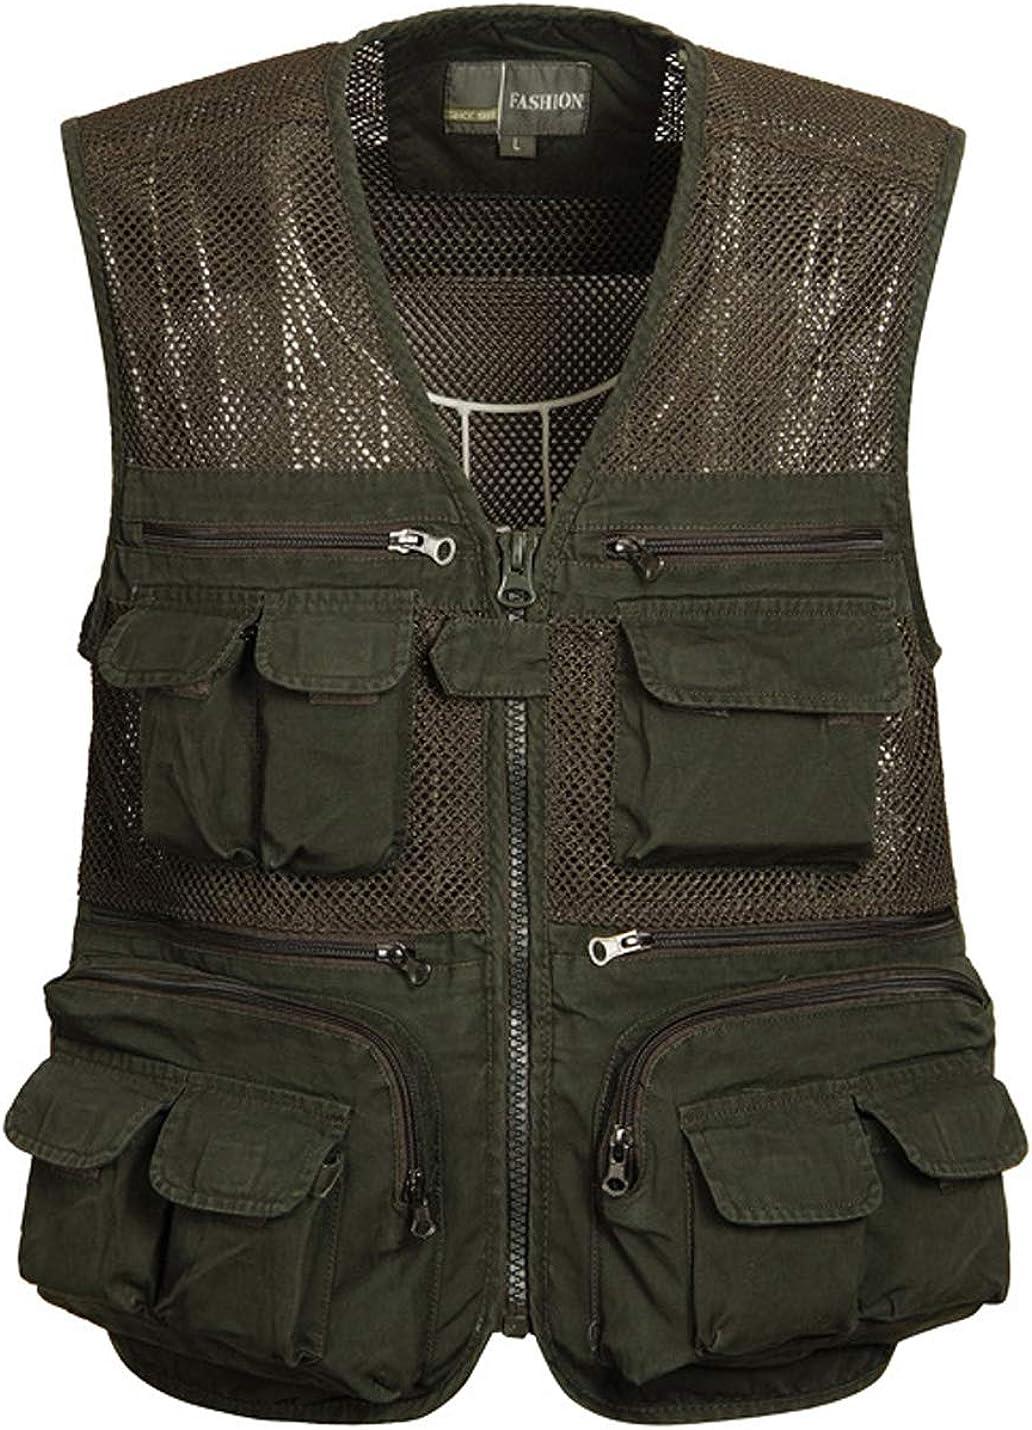 Gihuo Men's Casual Outdoor Multi Pockets Lightweight Fishing Safari Travel Cotton Vest